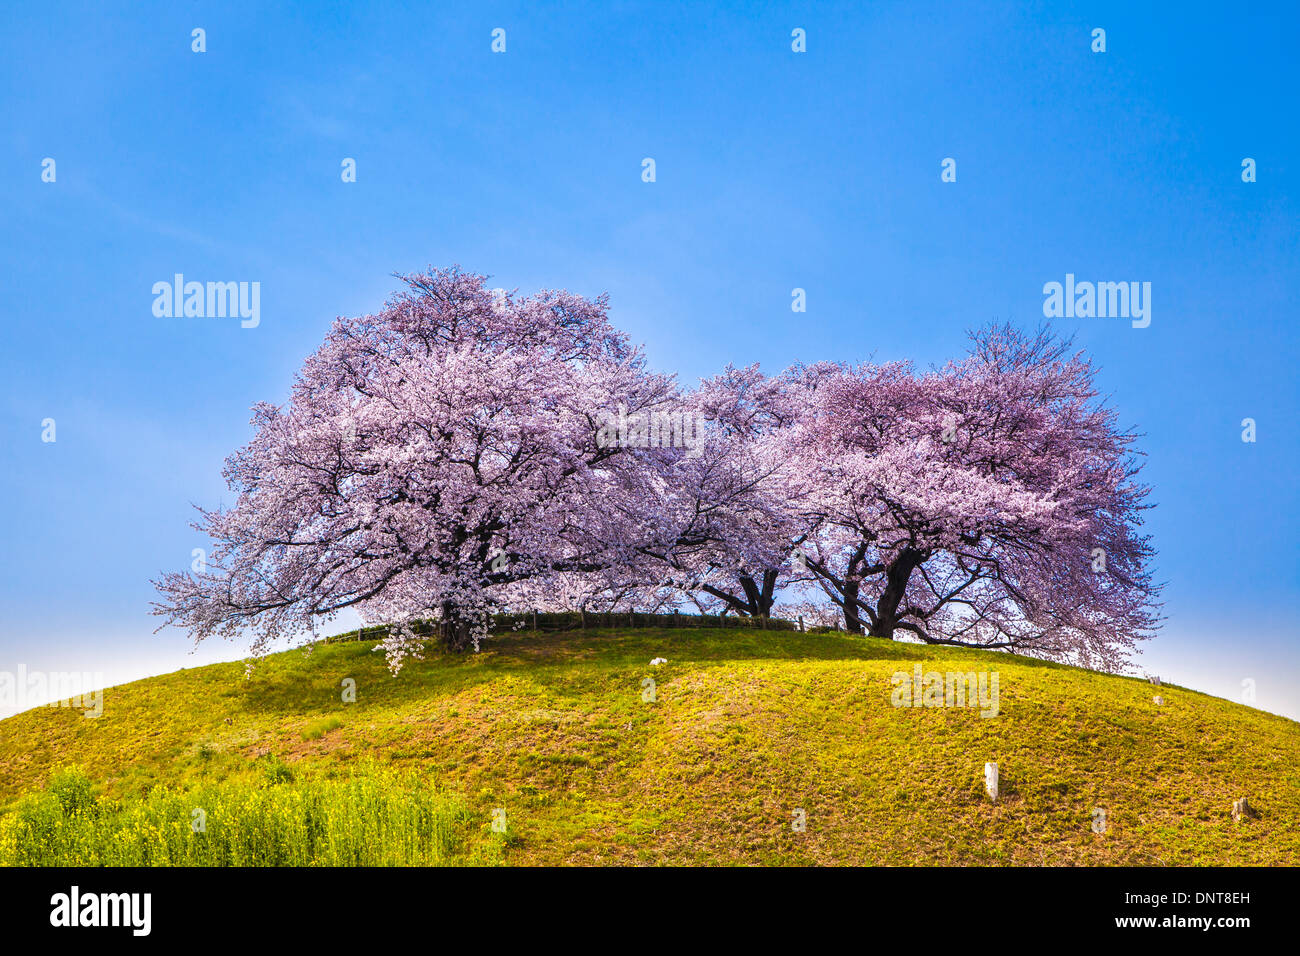 Cherry Tree sur la colline, Sakitama Tumulus, Saitama, Japon Photo Stock